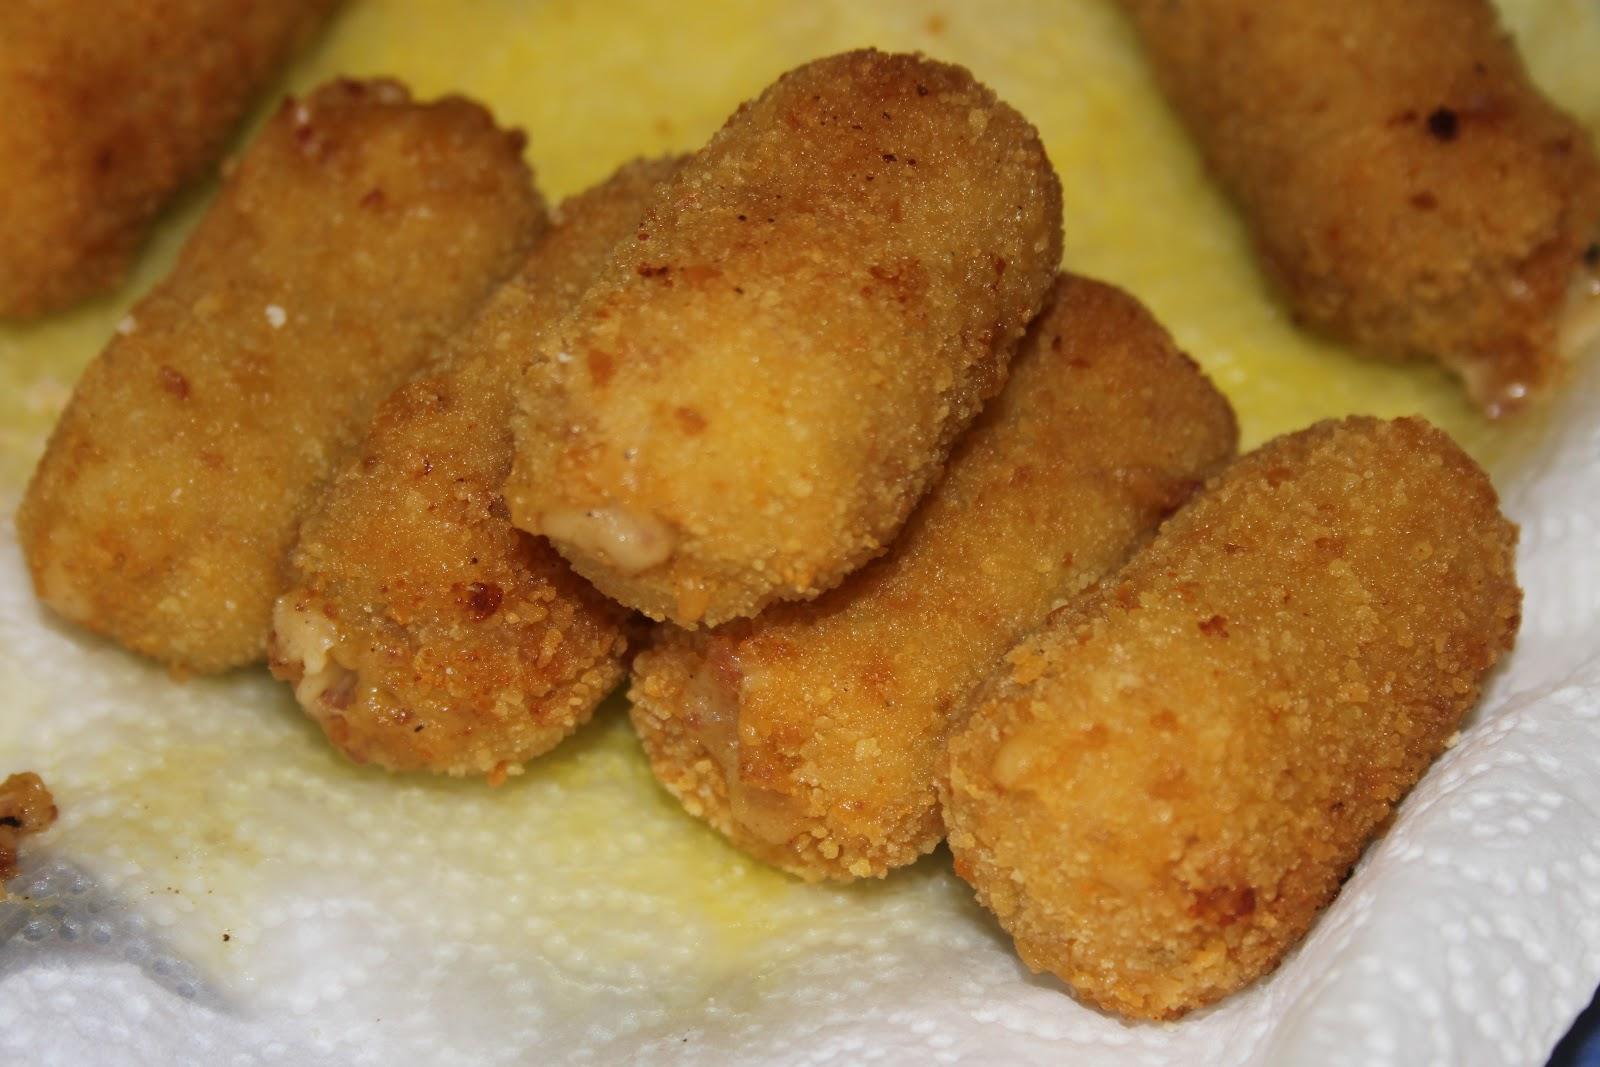 Croquette De Jambon Au Four croquettes de jambon serrano - la cuisine de bernard